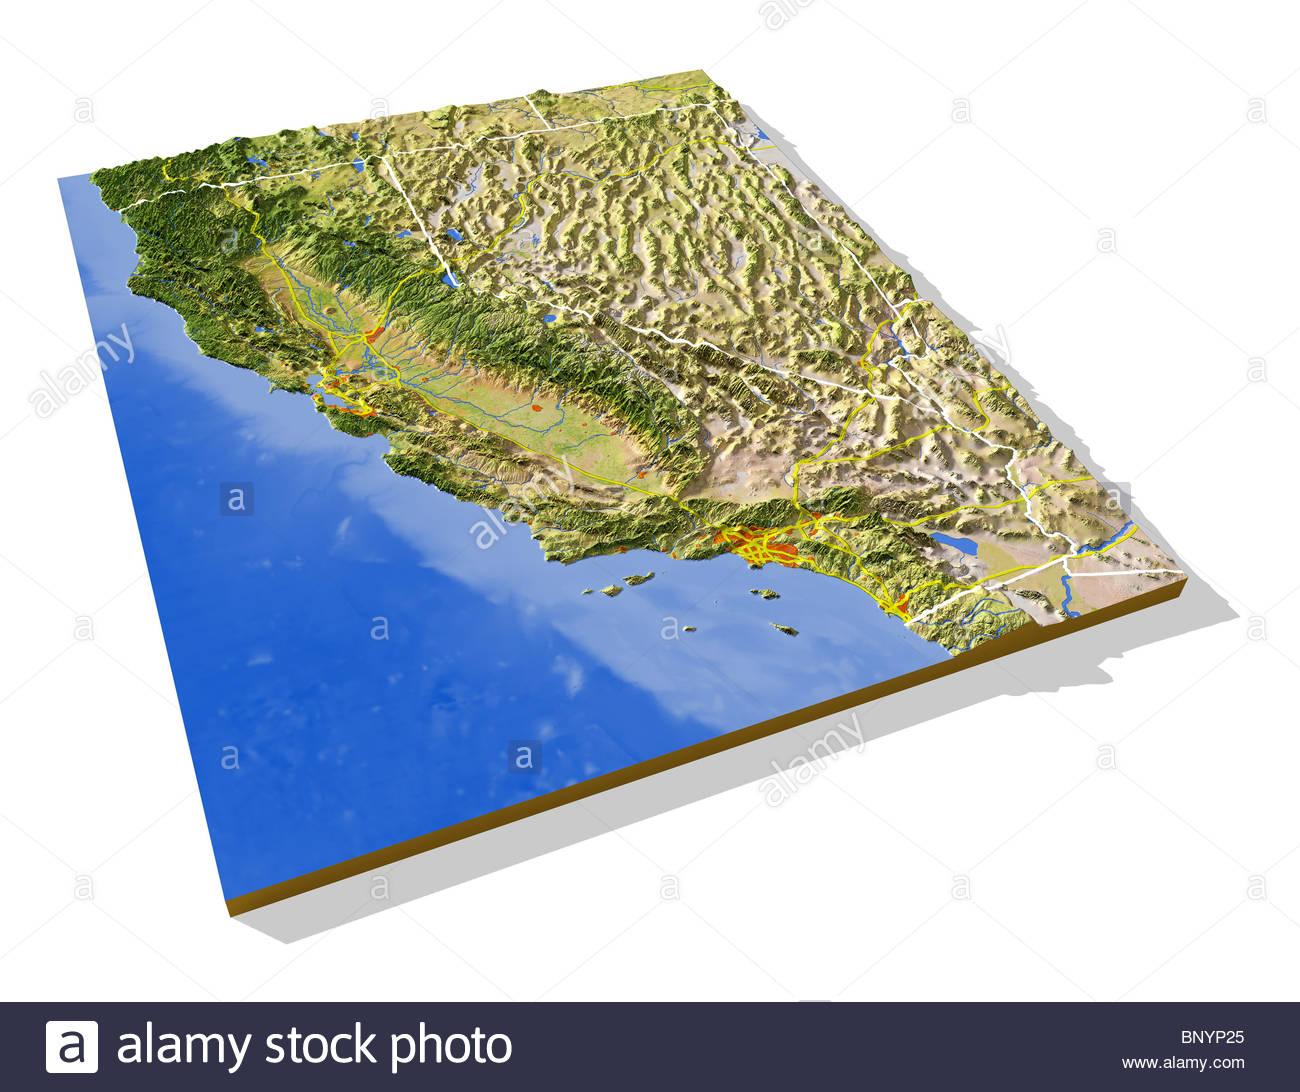 Topographic Map California Photos & Topographic Map California - 3D Map Of California